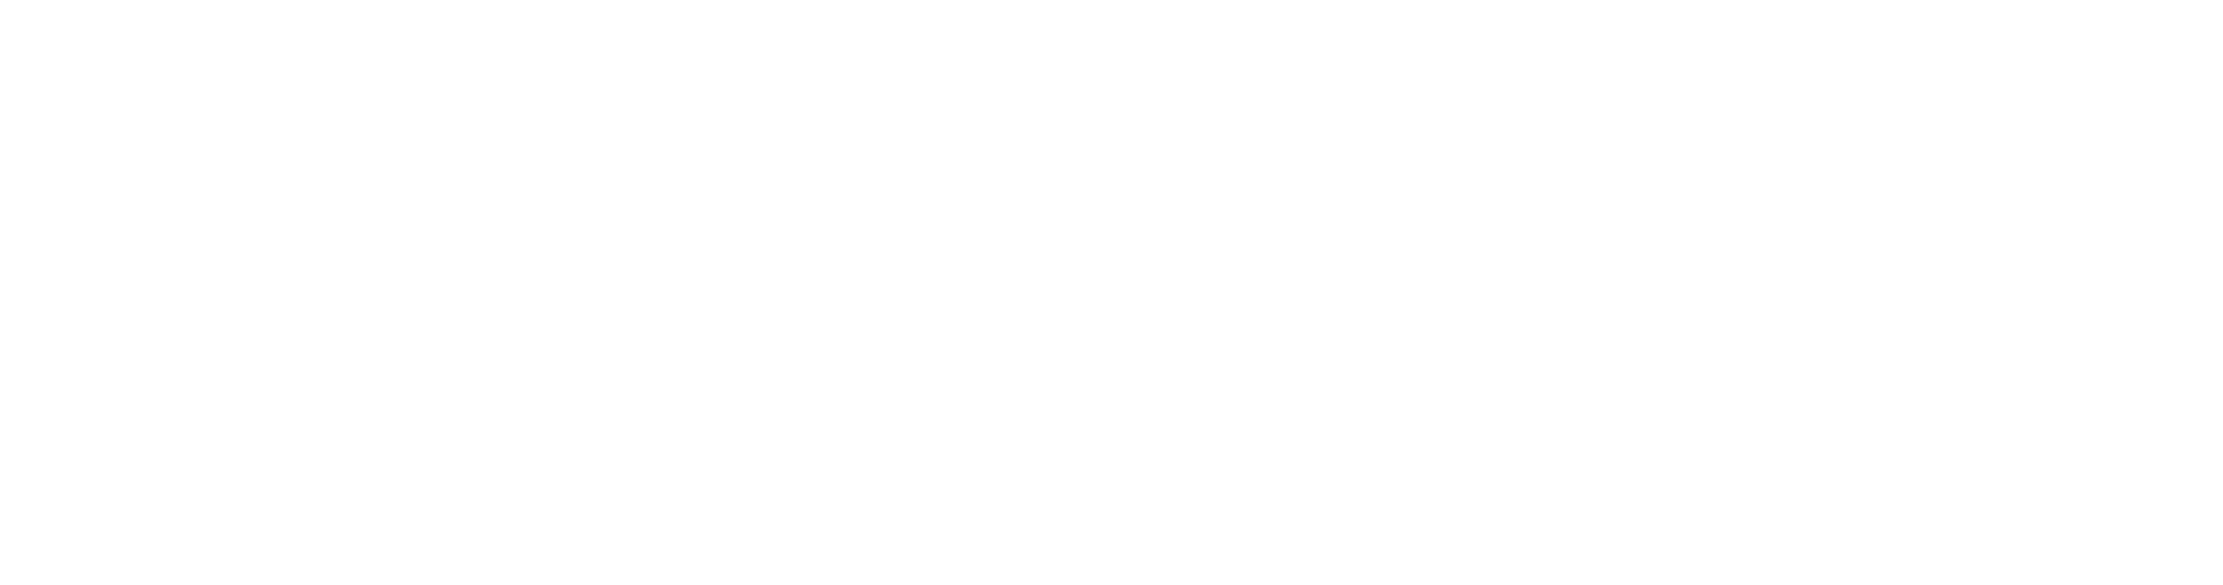 Nürburgink